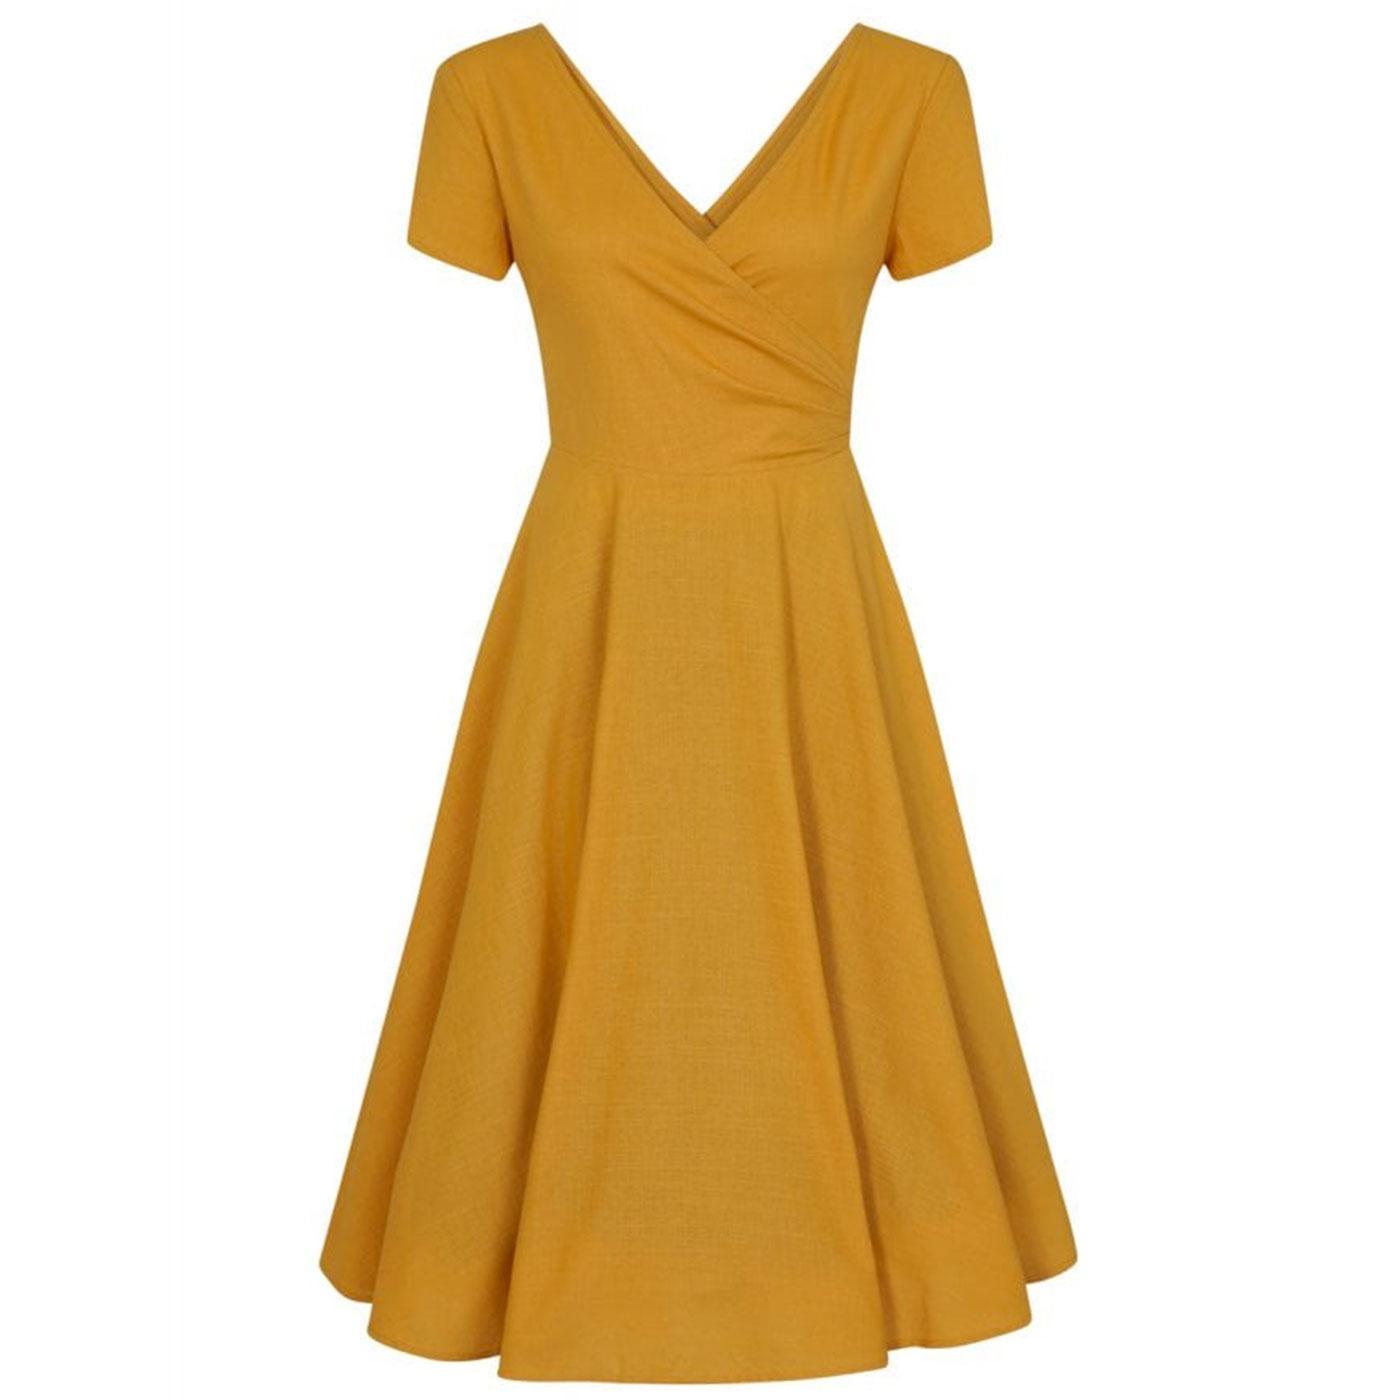 Maria COLLECTIF Retro 50s Wrap Summer Swing Dress